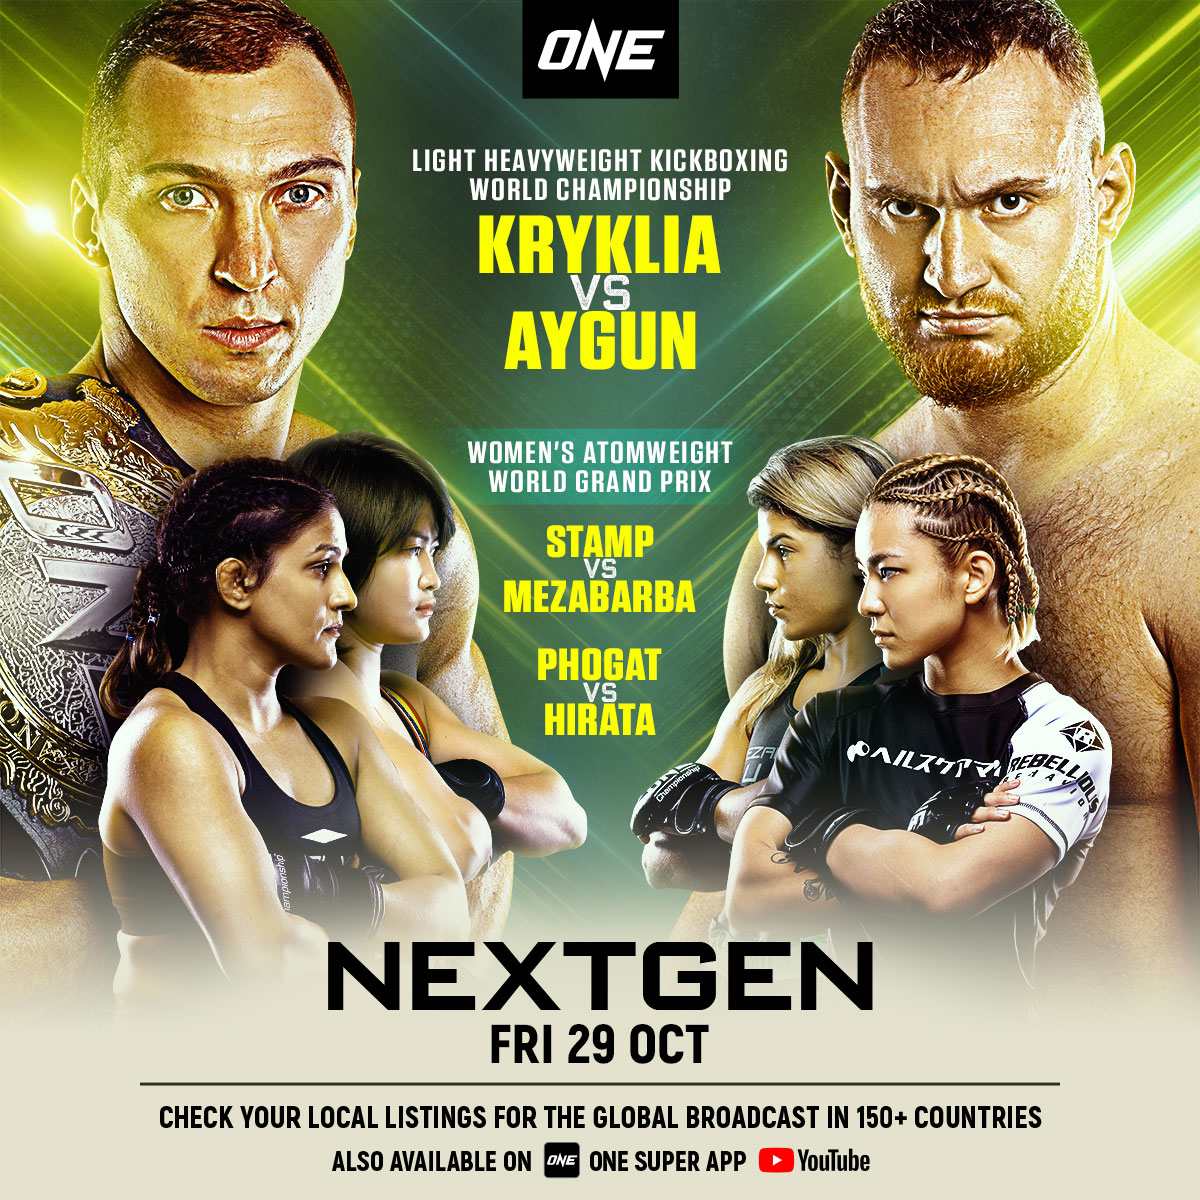 ONE - NextGen